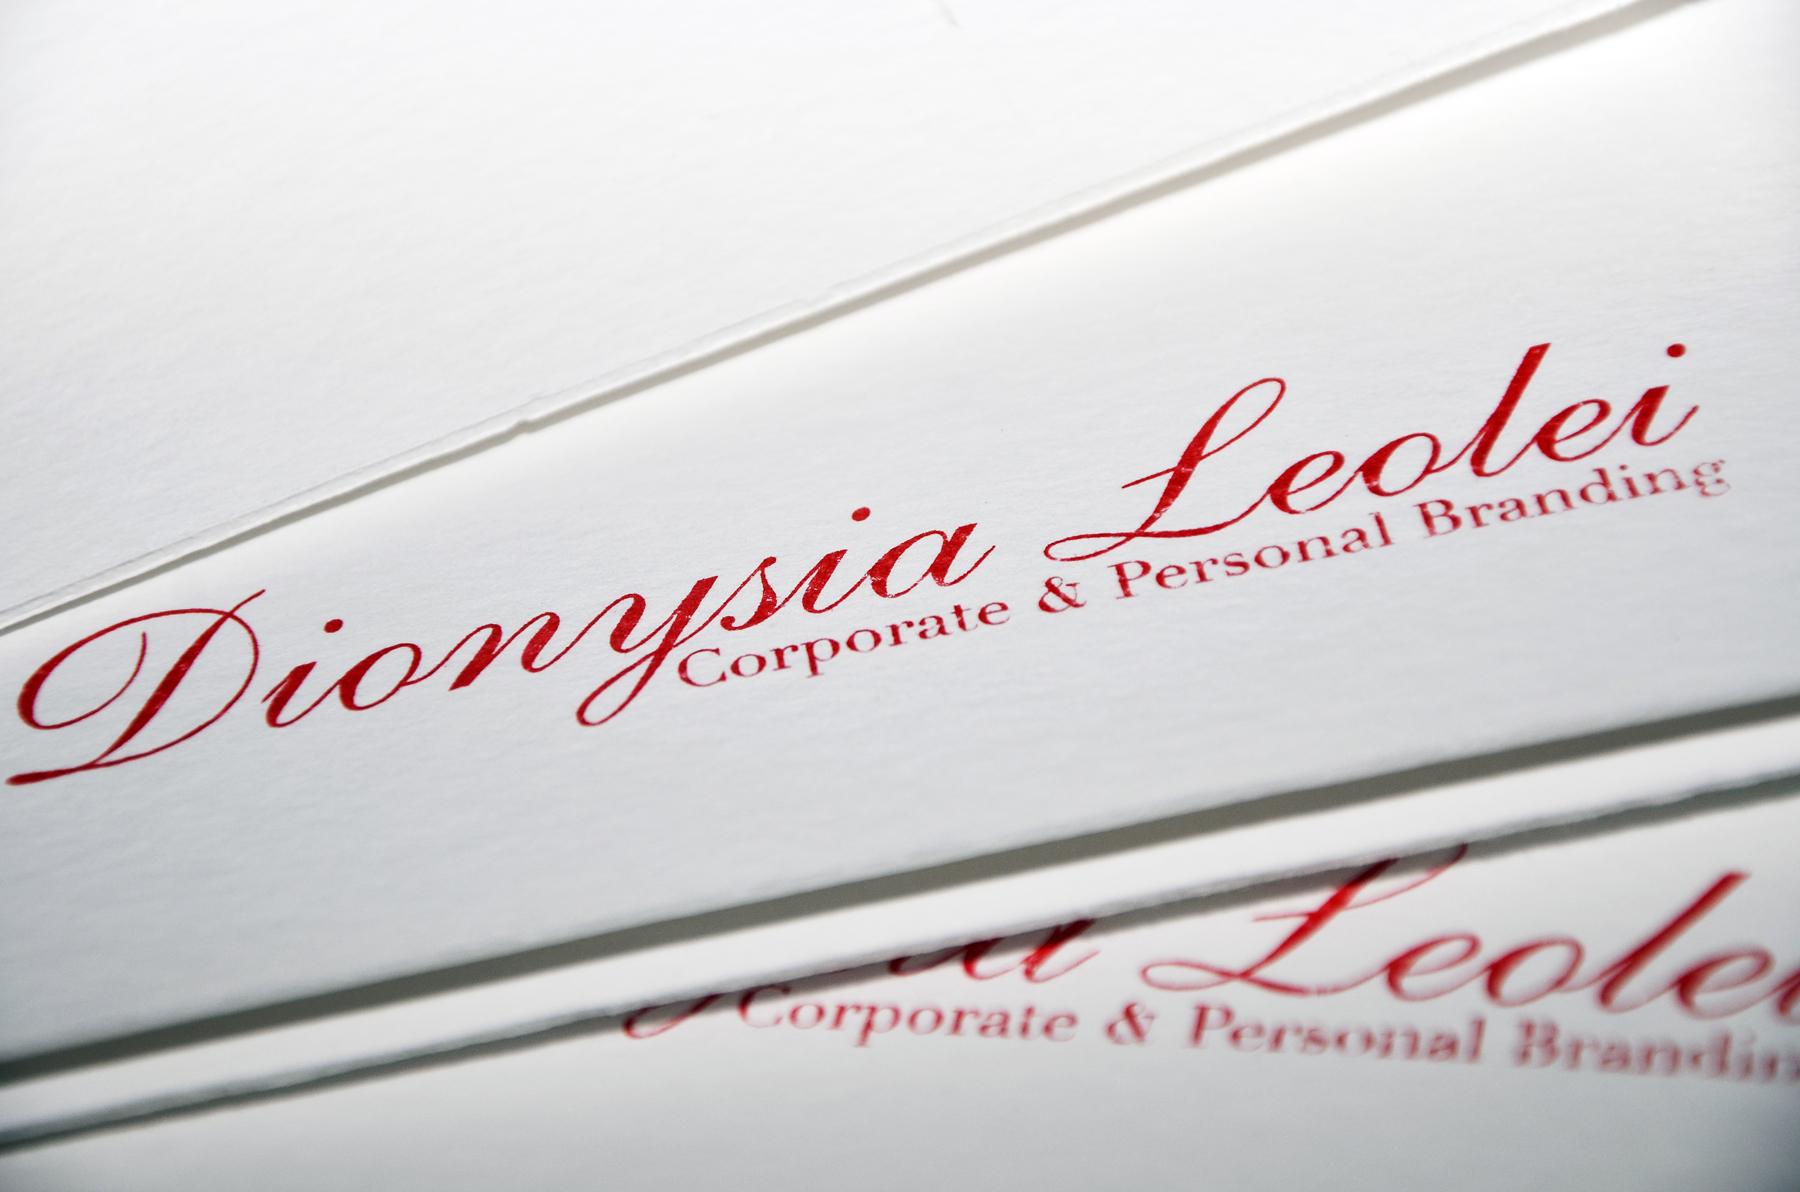 Dionysia Leolei Folders Design